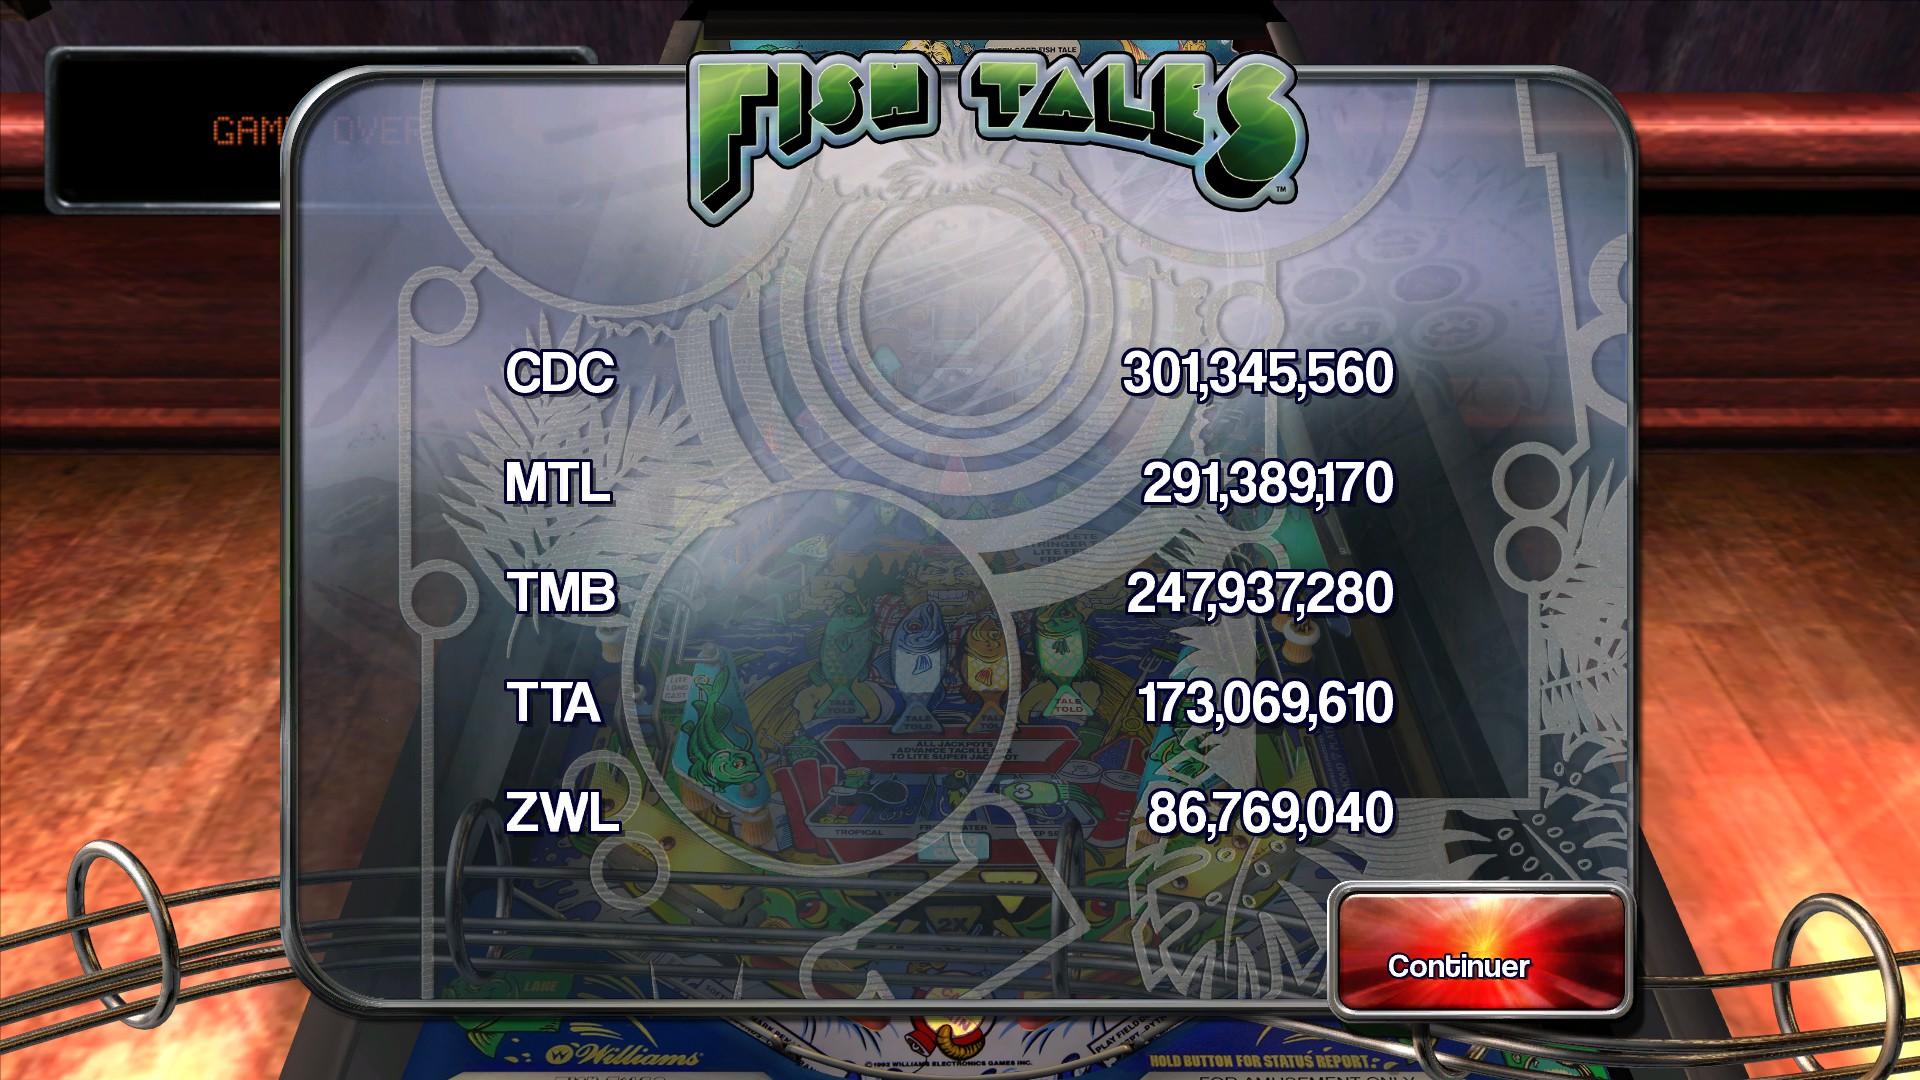 Mantalow: Pinball Arcade: Fish Tales (PC) 291,389,170 points on 2015-03-06 11:23:21